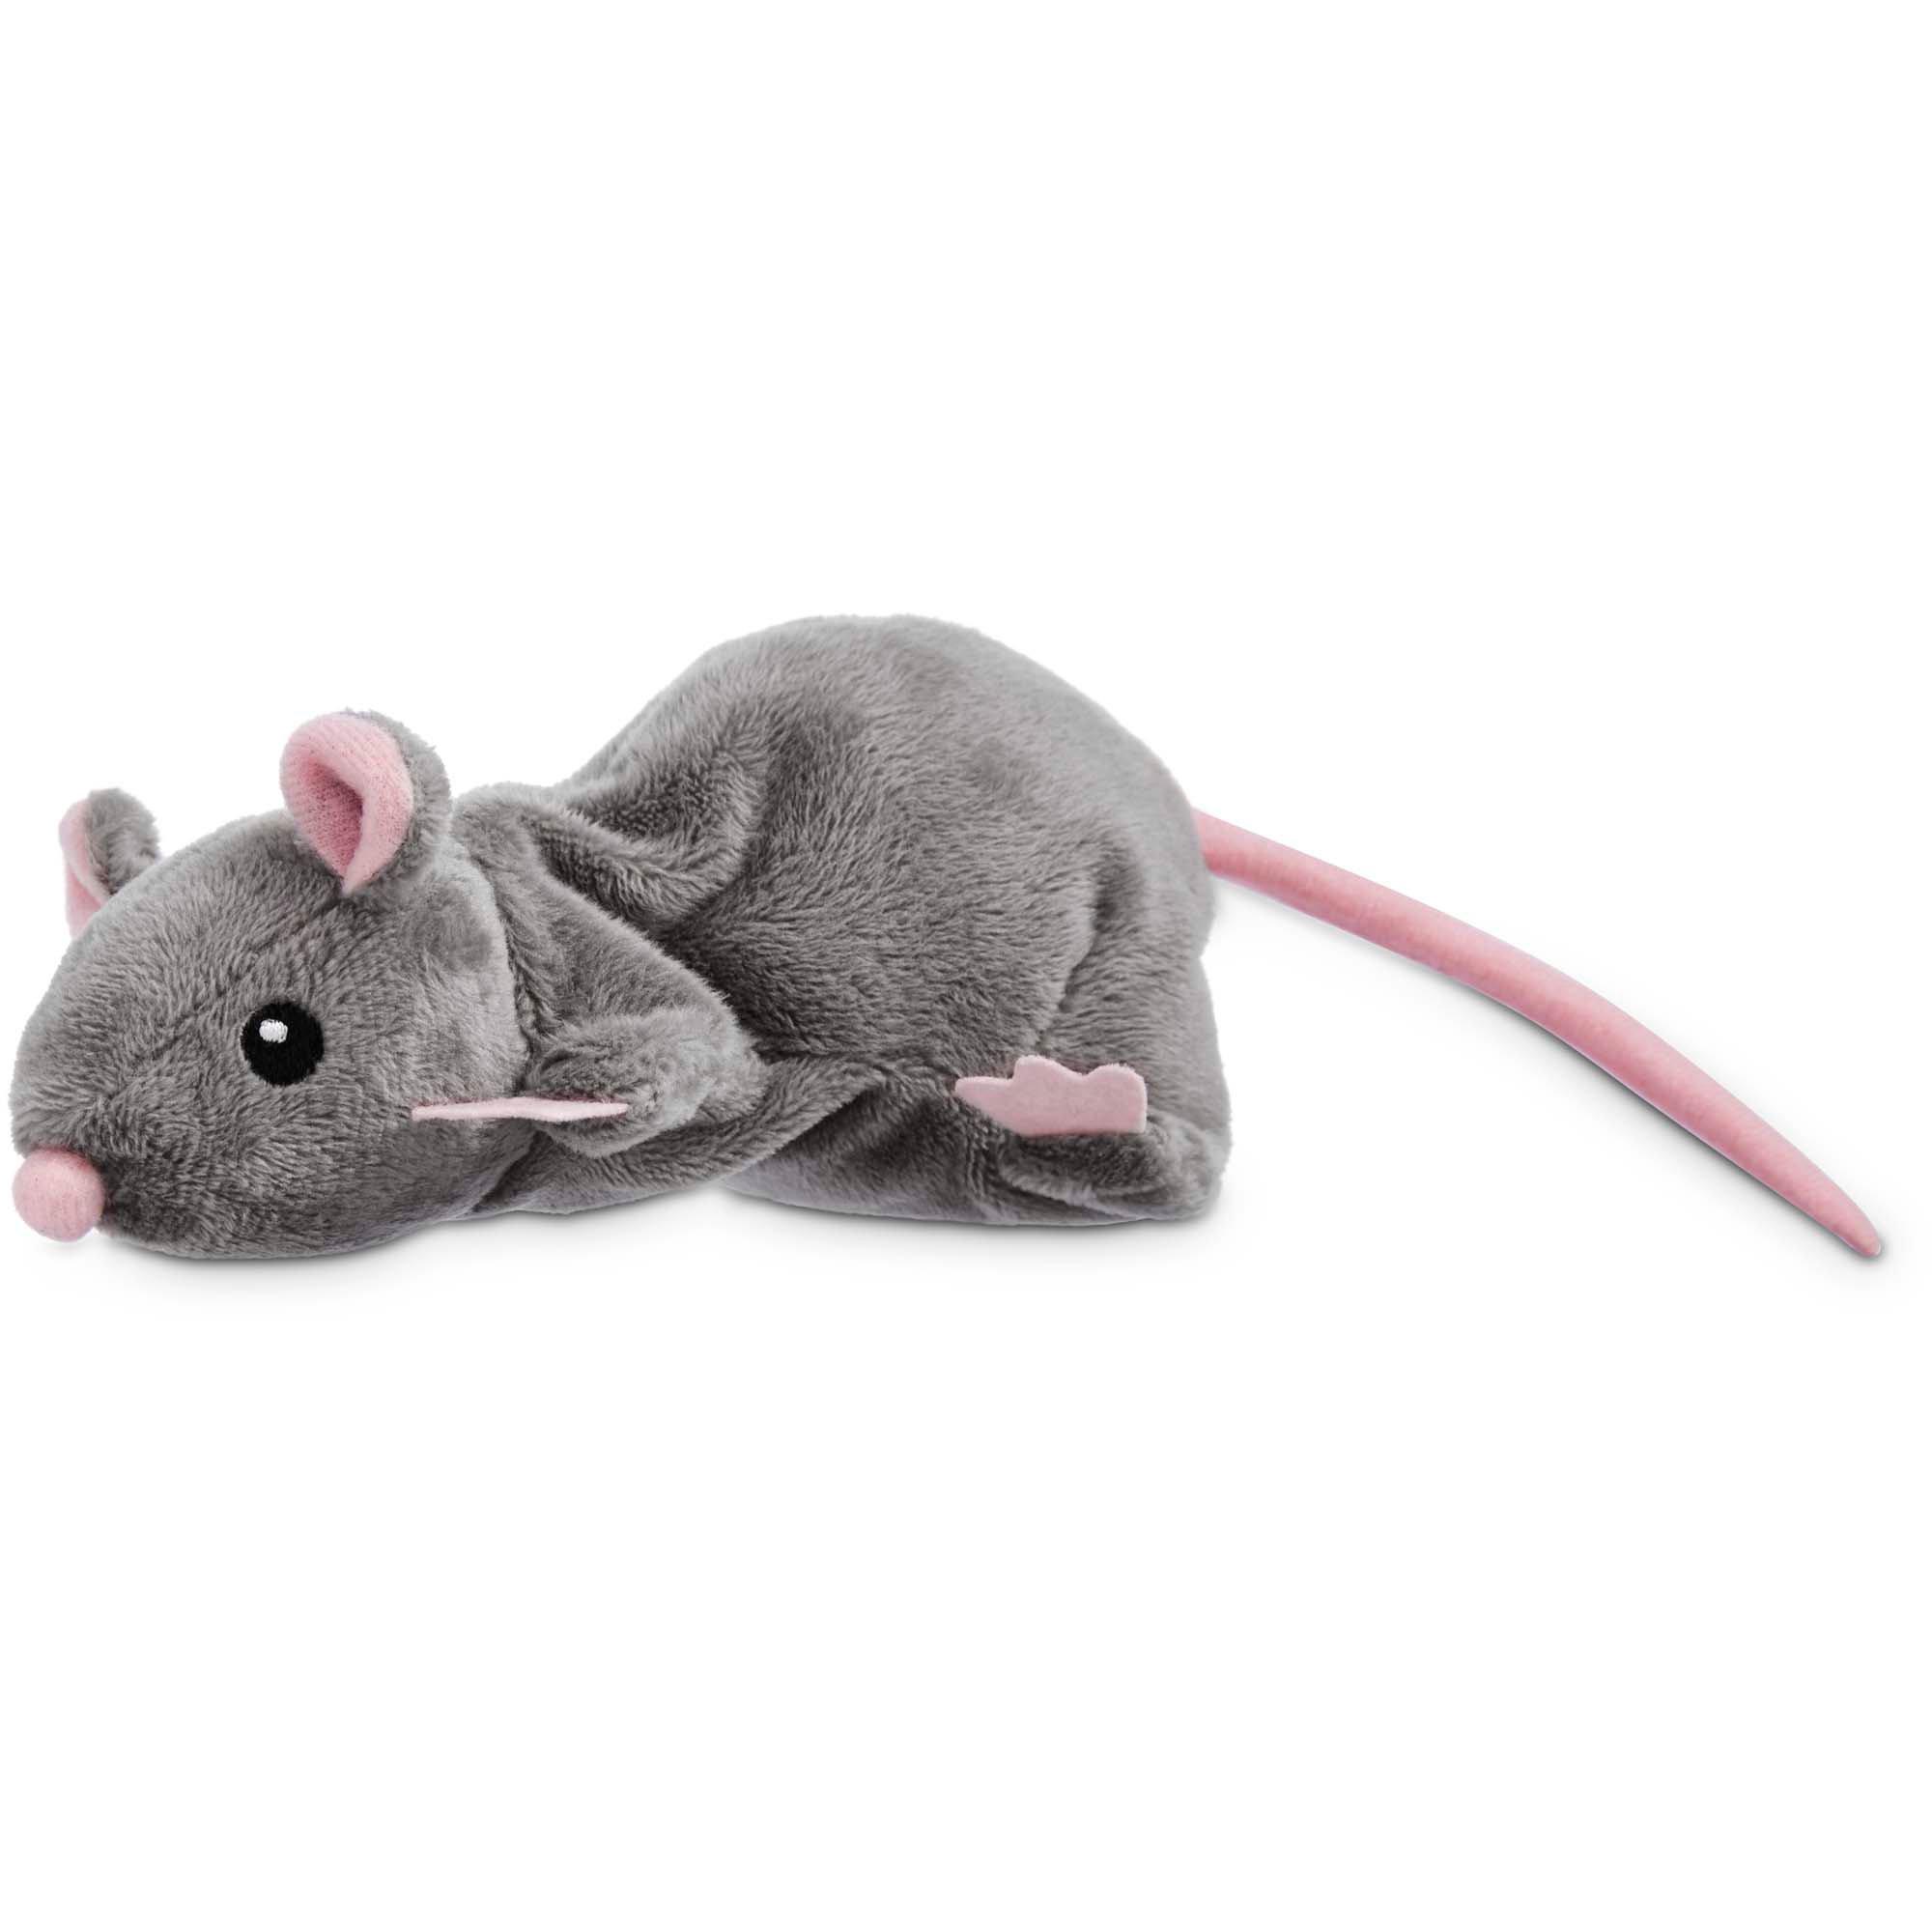 Leaps & Bounds Grey Rat Cat Toy | Petco